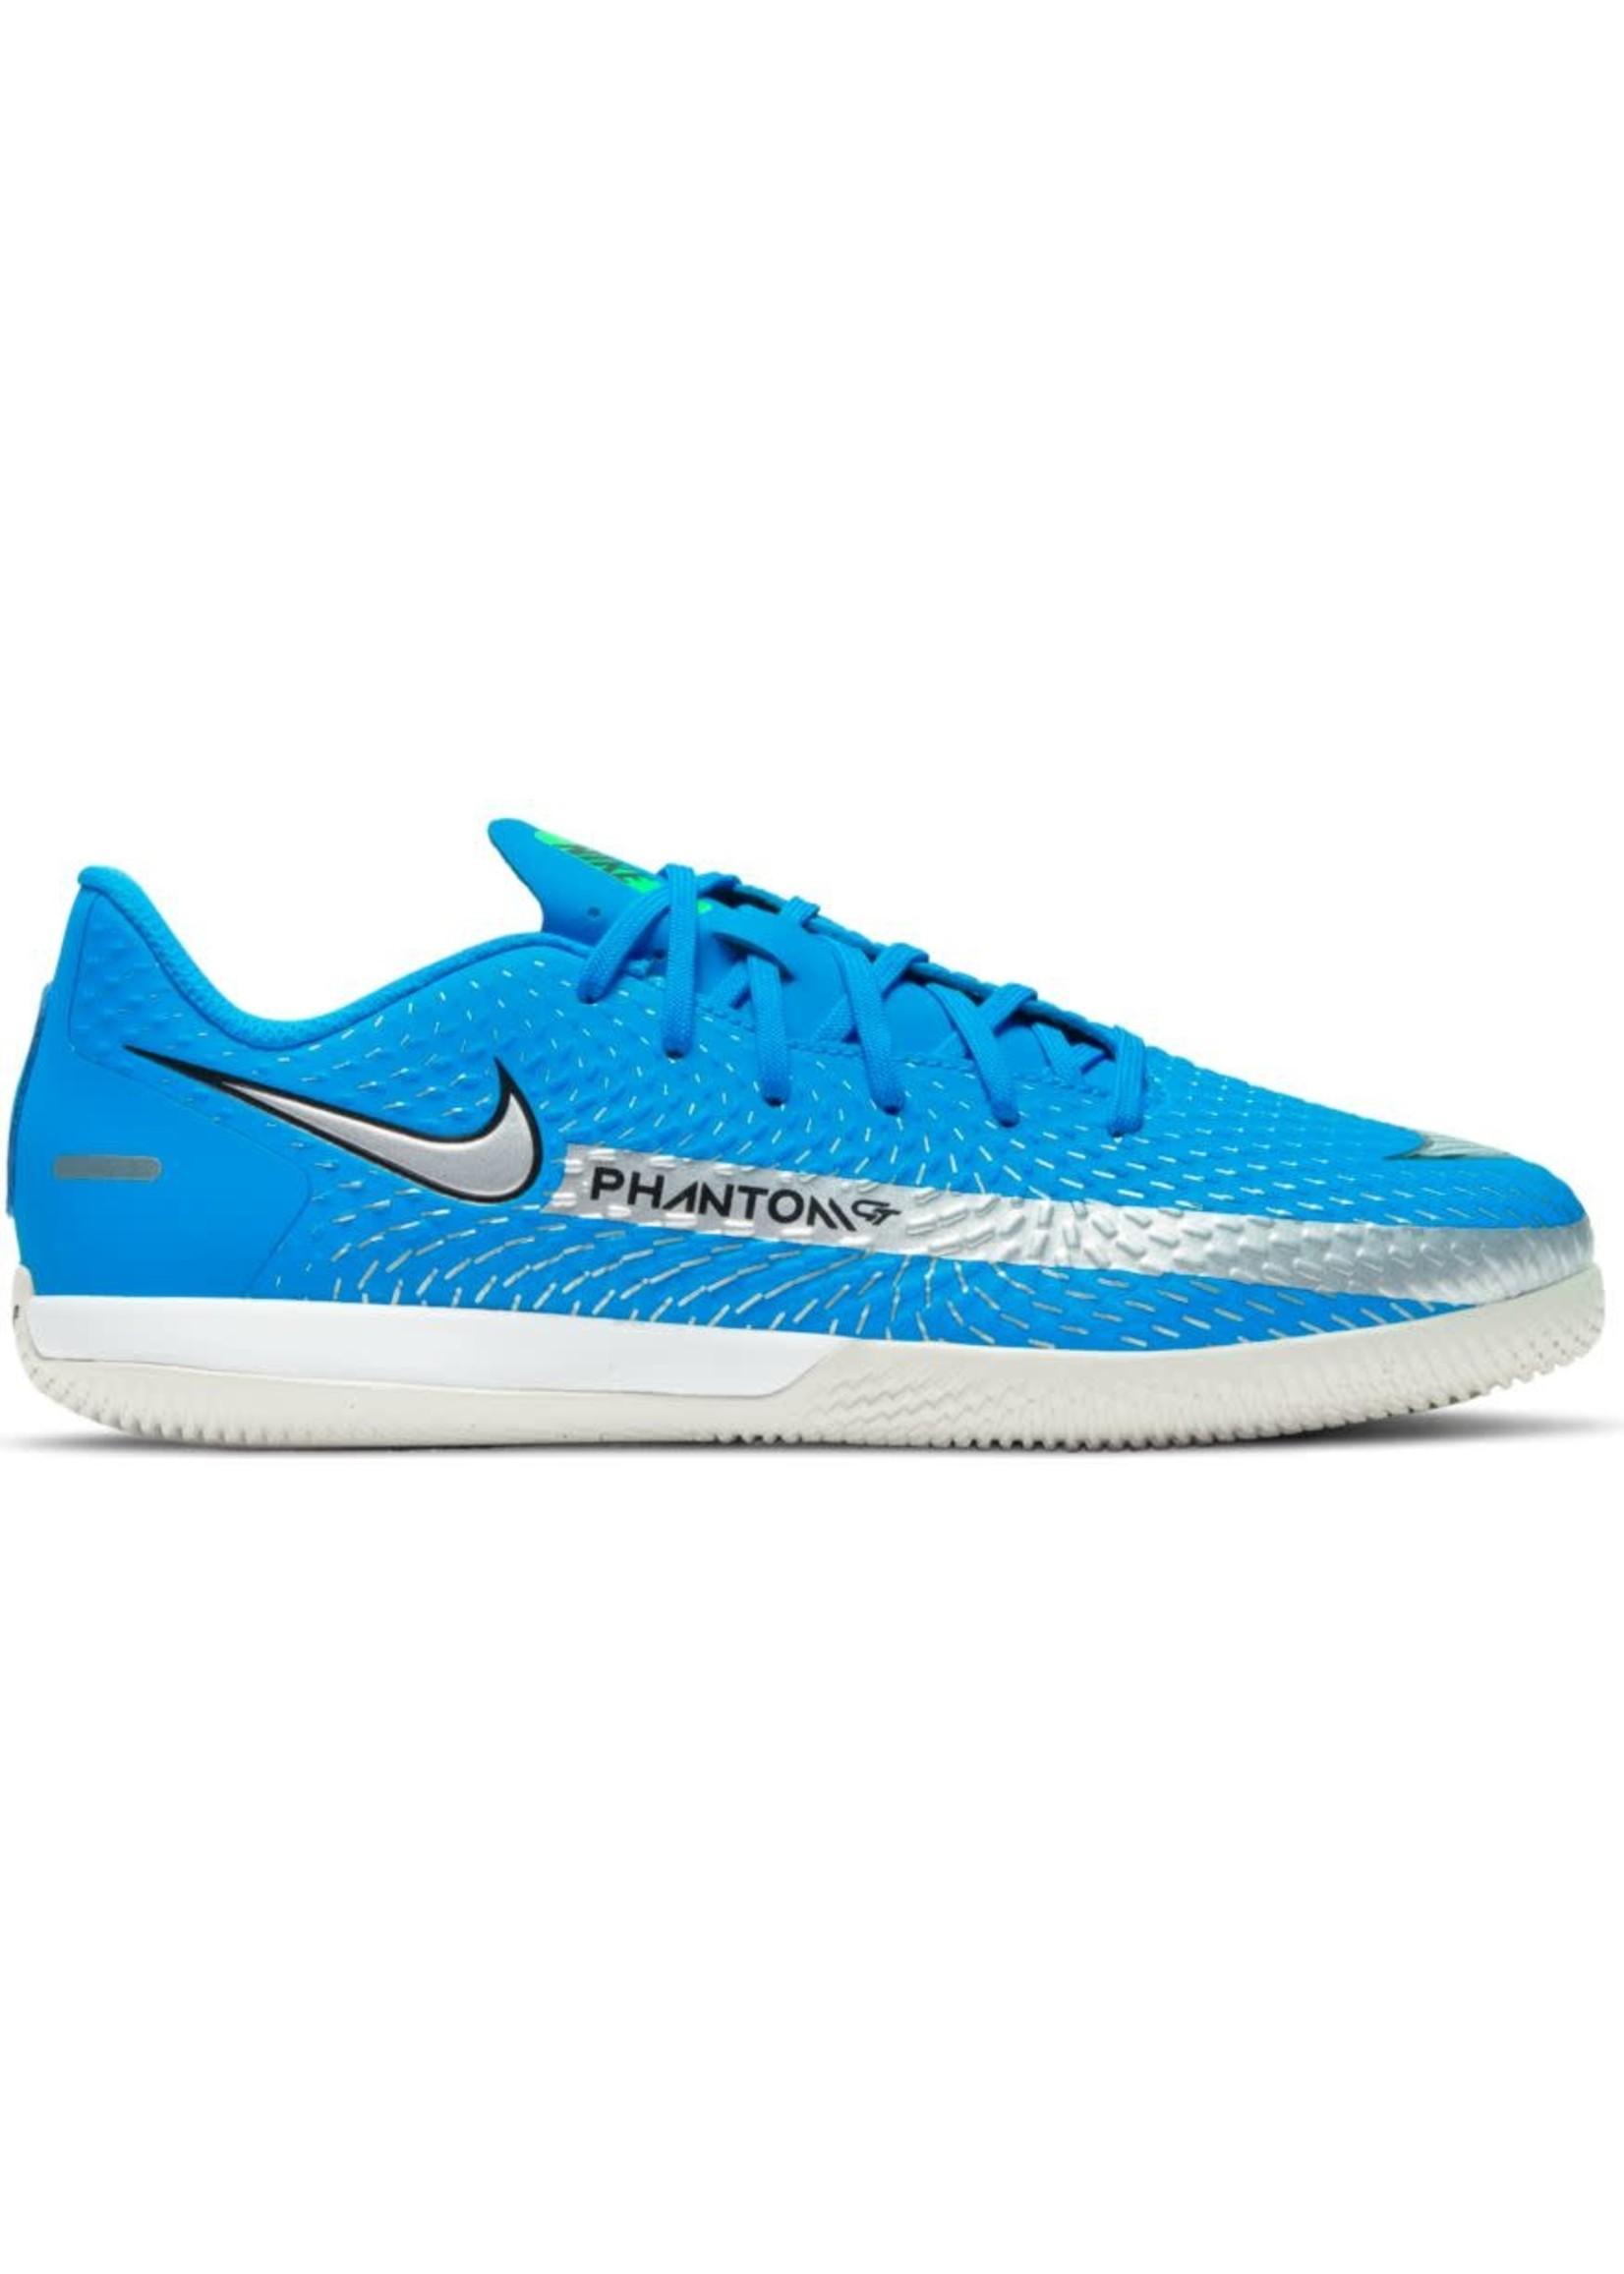 Nike Phantom GT Academy IC - Blue/Silver